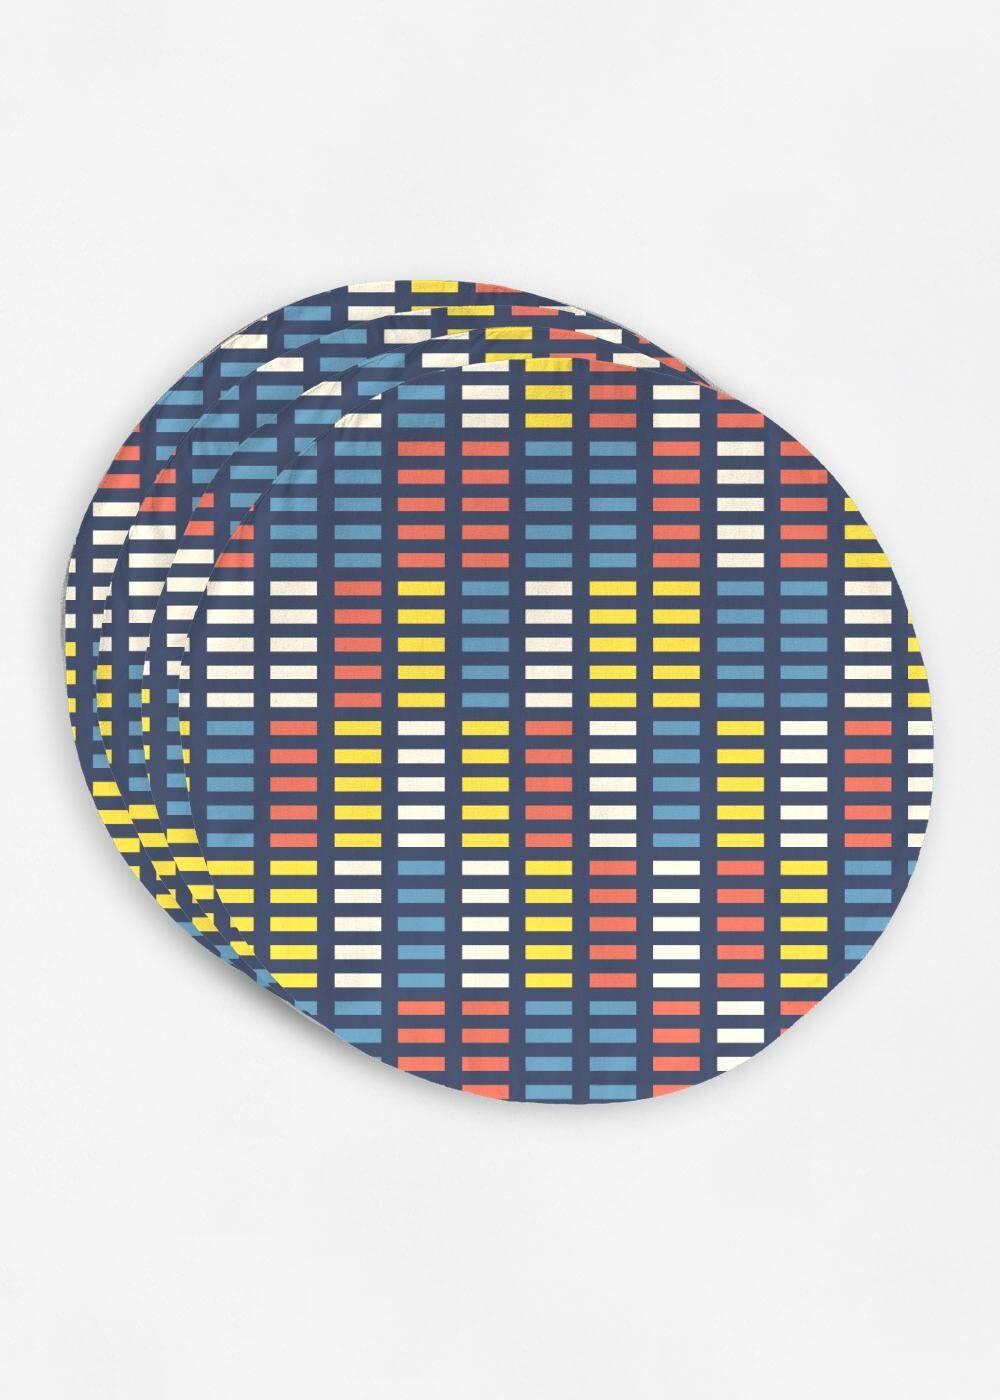 VIDA Placemat Set - Retro Music Equalizer by VIDA Original Artist  - Size: Set of 4